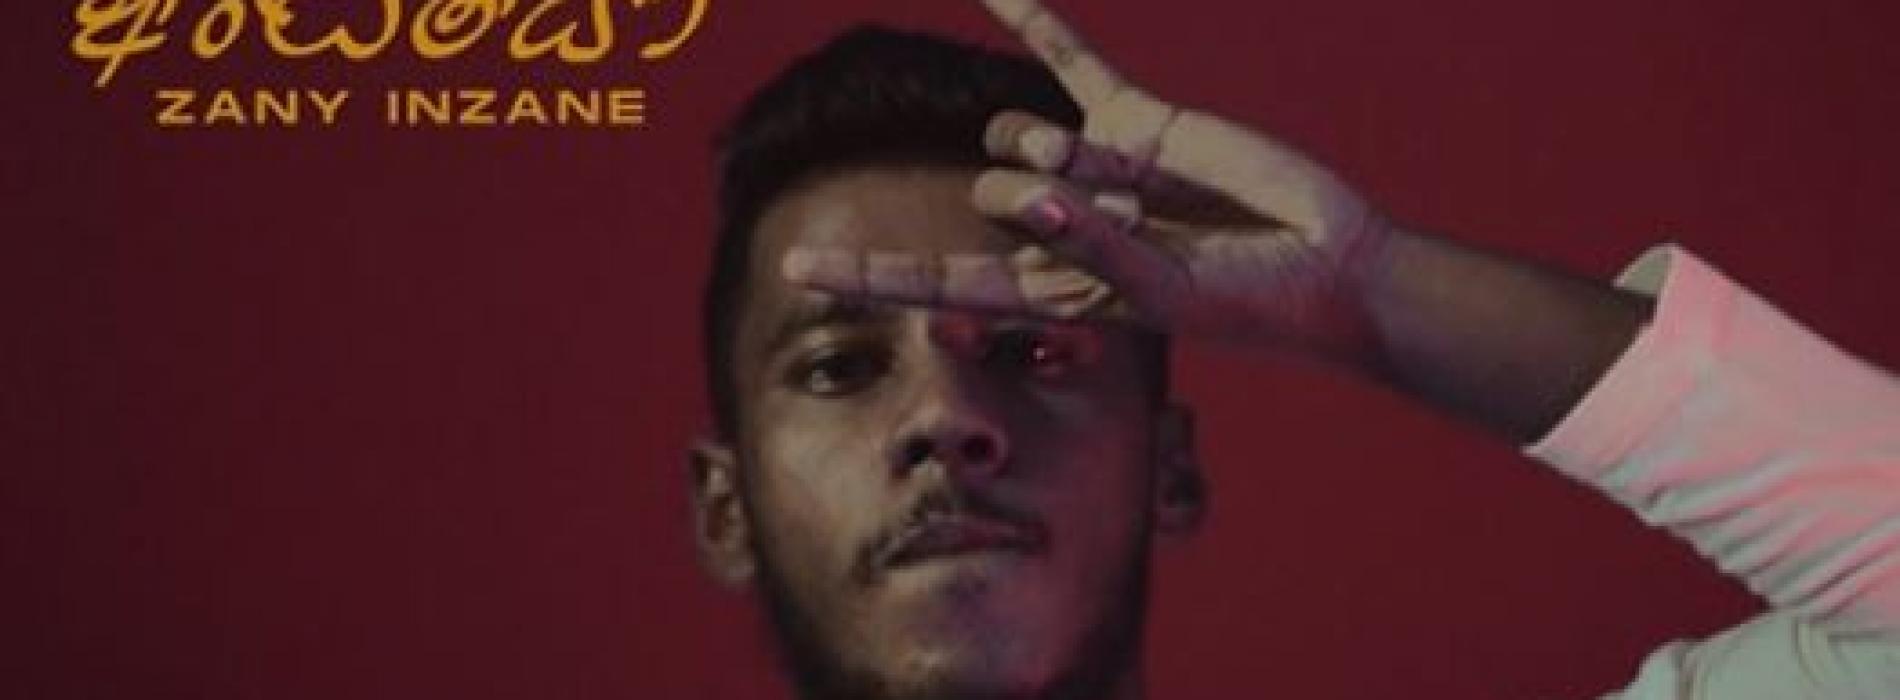 New Music : Zany Inzane – Andhayo අංධයෝ (Freestyle Video)